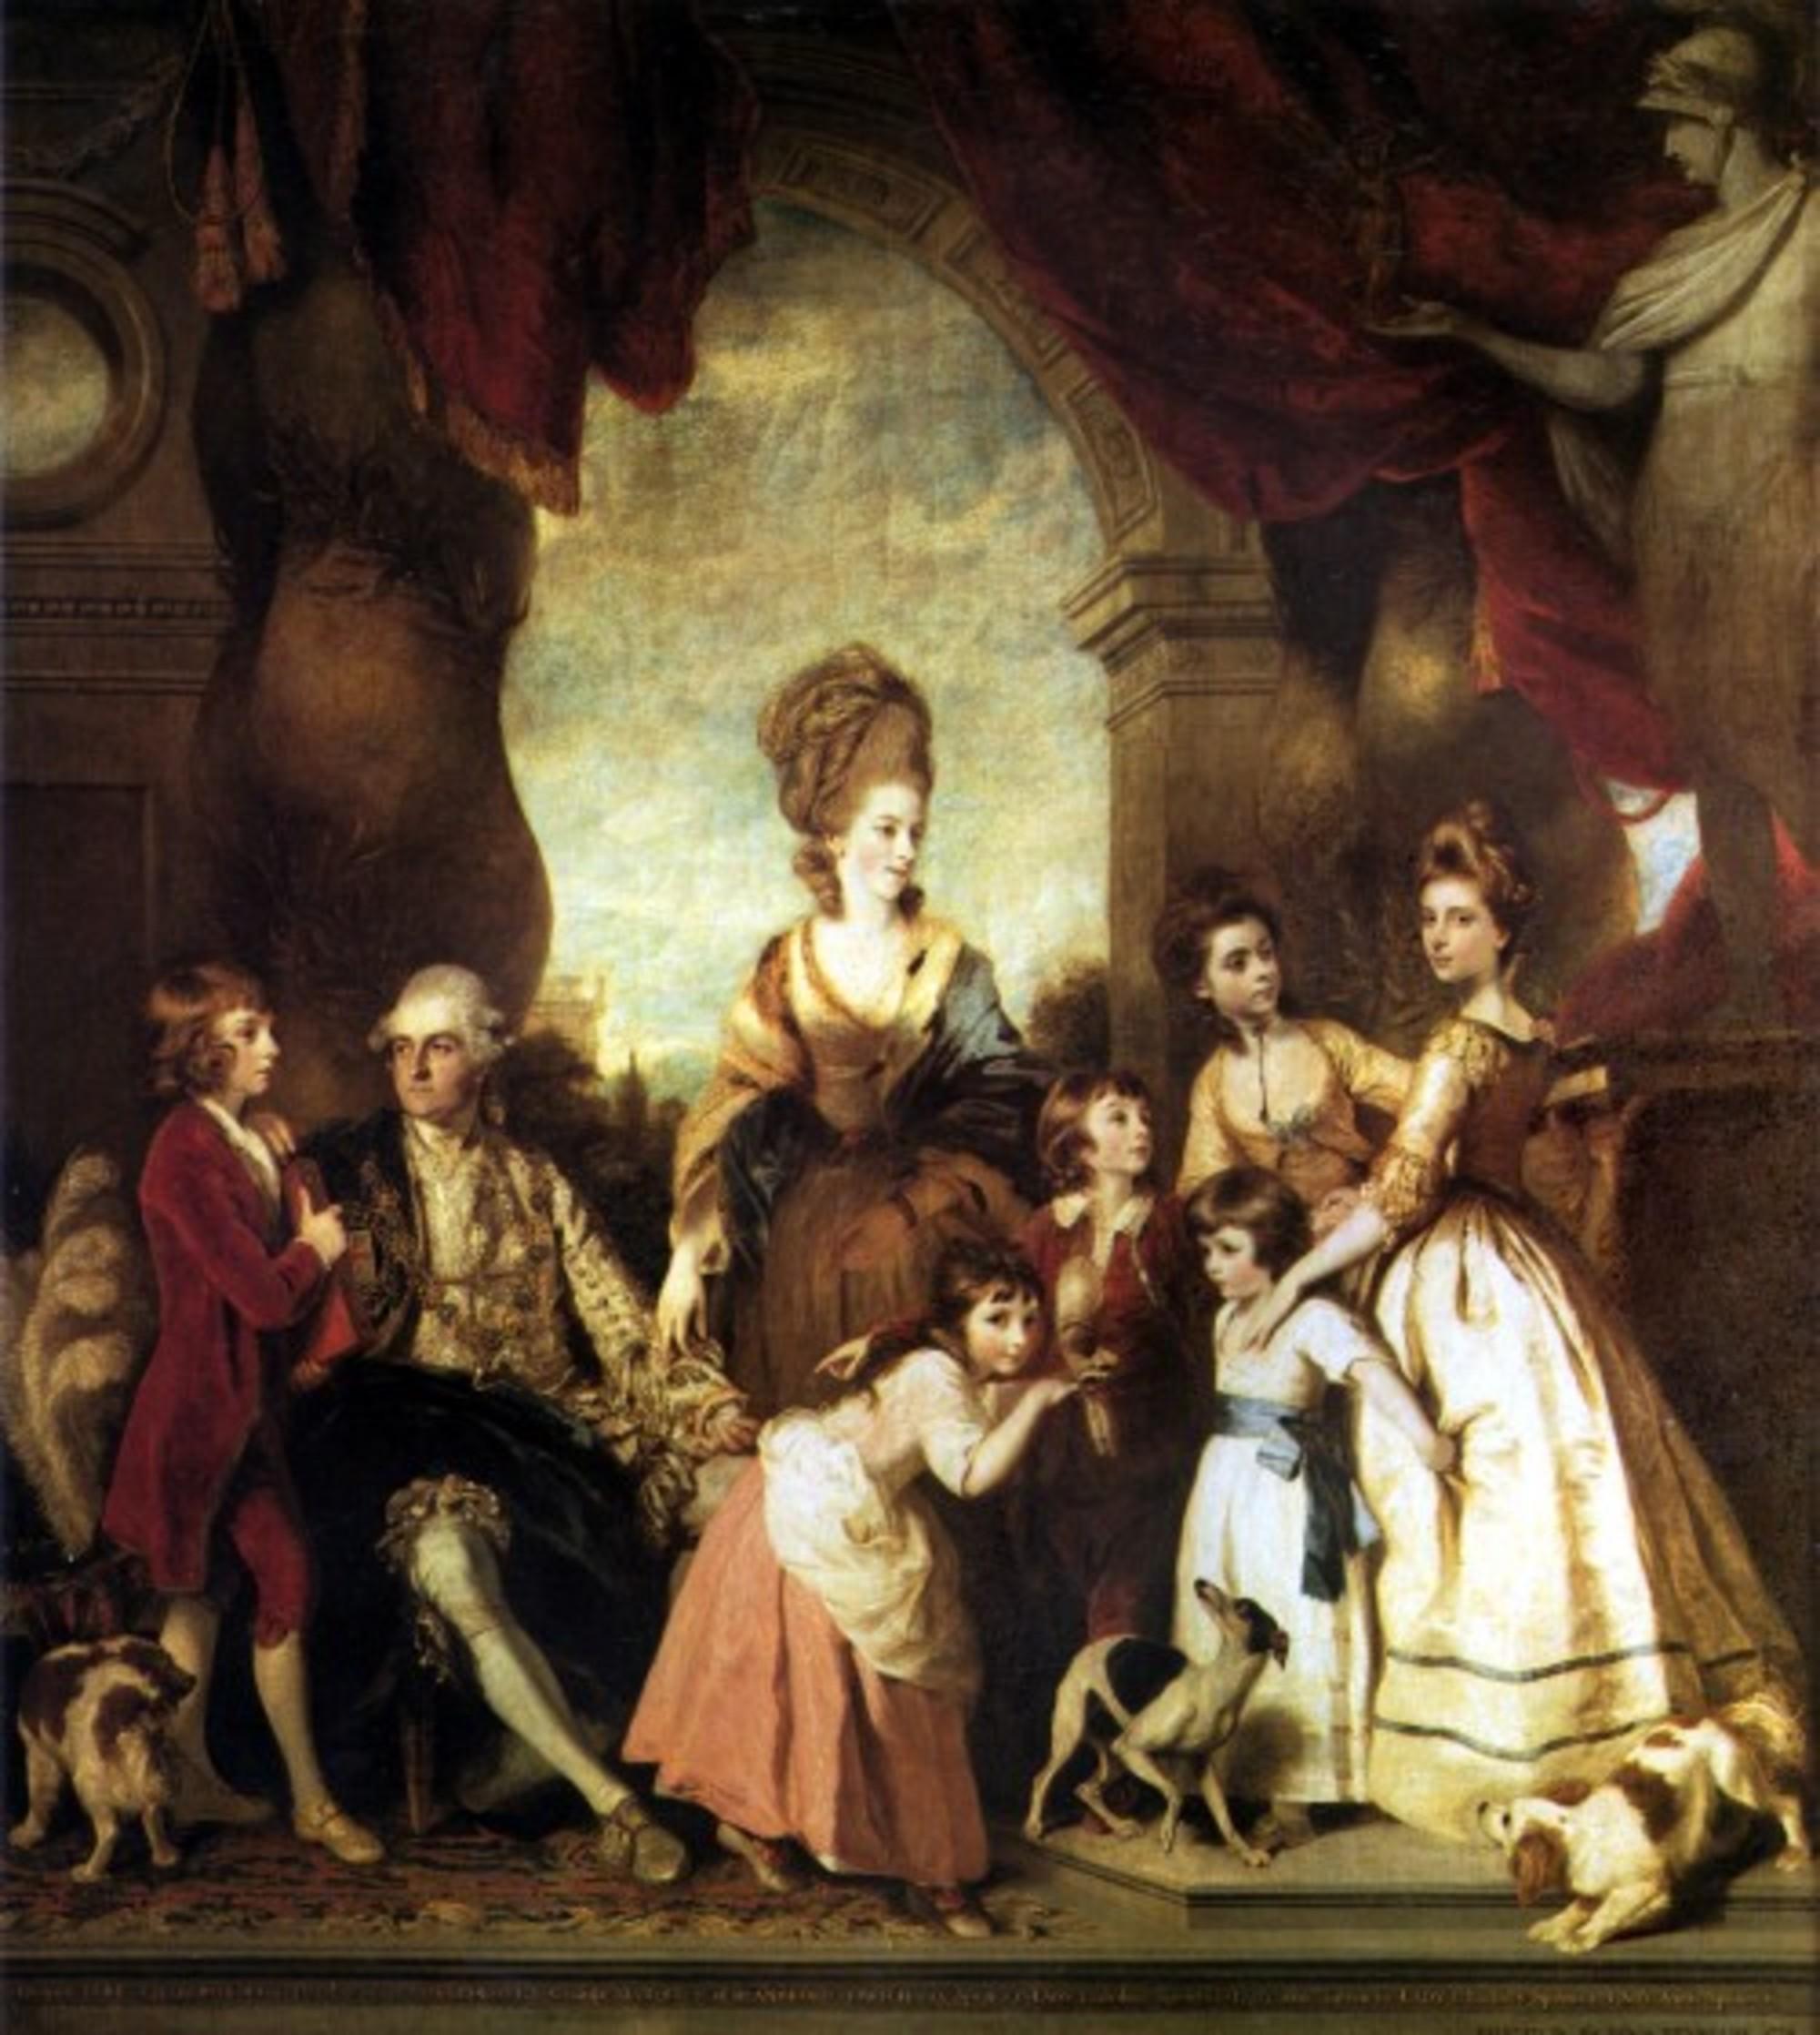 Reynolds_-_4th_Duke_of_Marlborough_and_Family.jpg